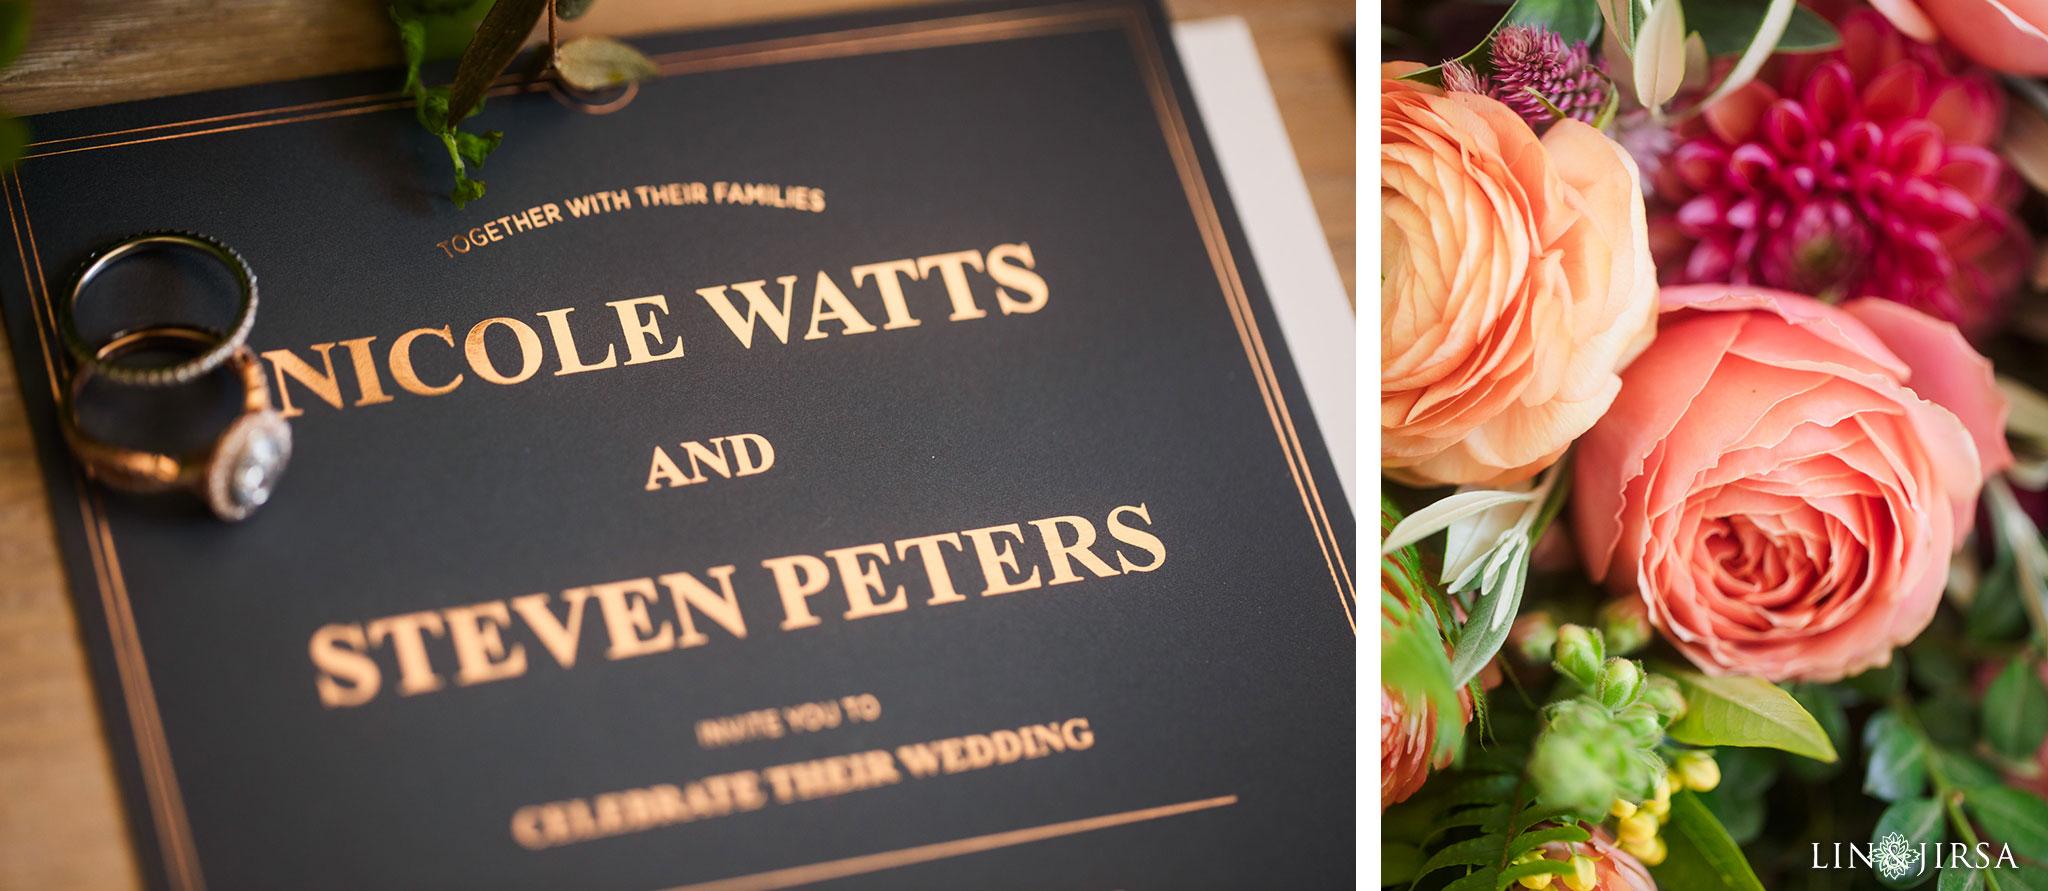 00 palos verdes wedding photography